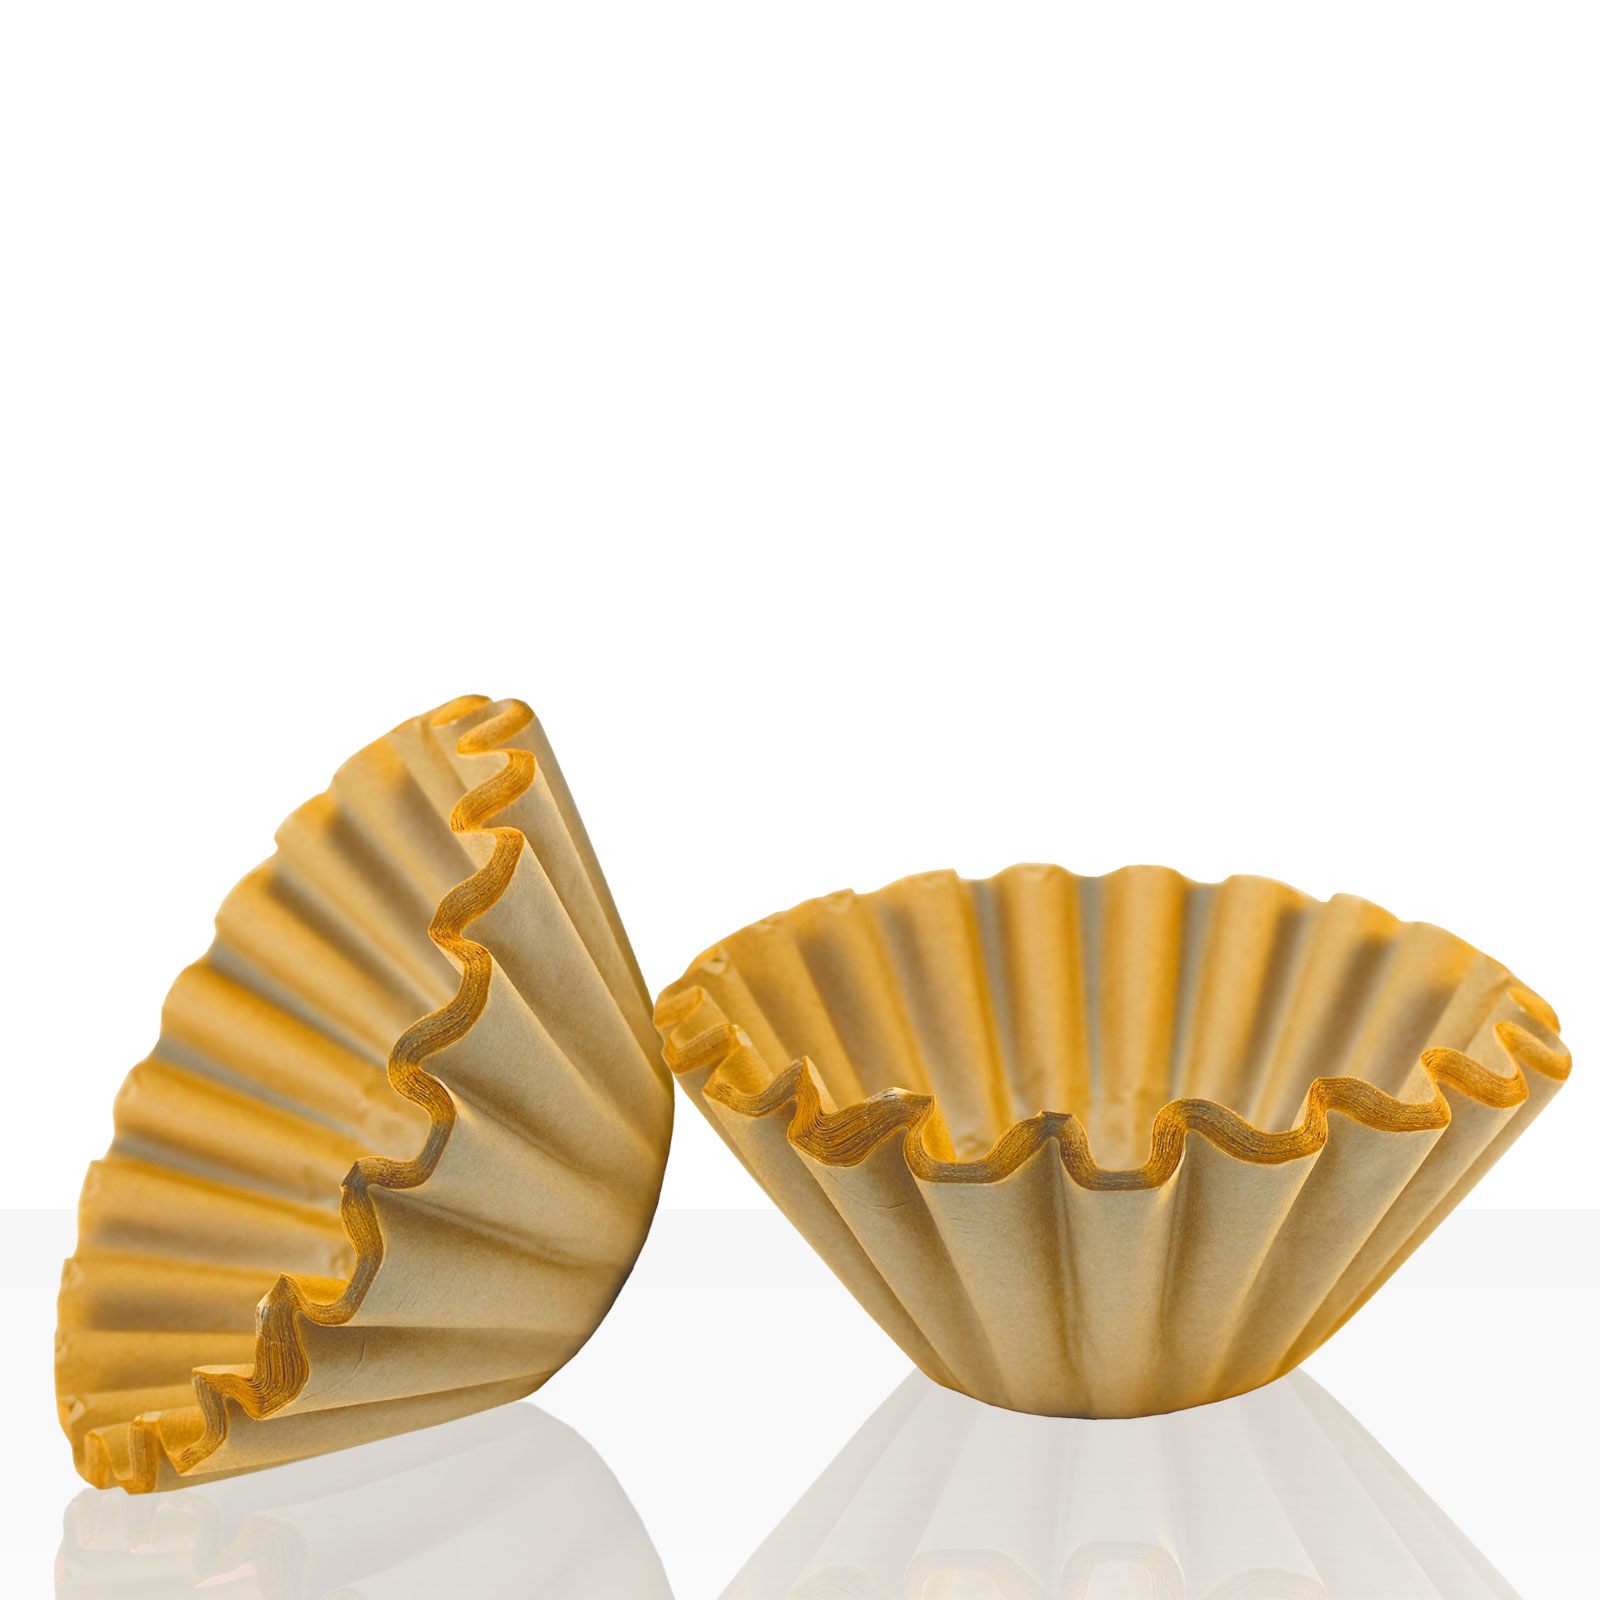 Korbfilter für Bonamat, Bartscher, Animo 85/245 mm, 4000 Stk braun, Kaffeefilter